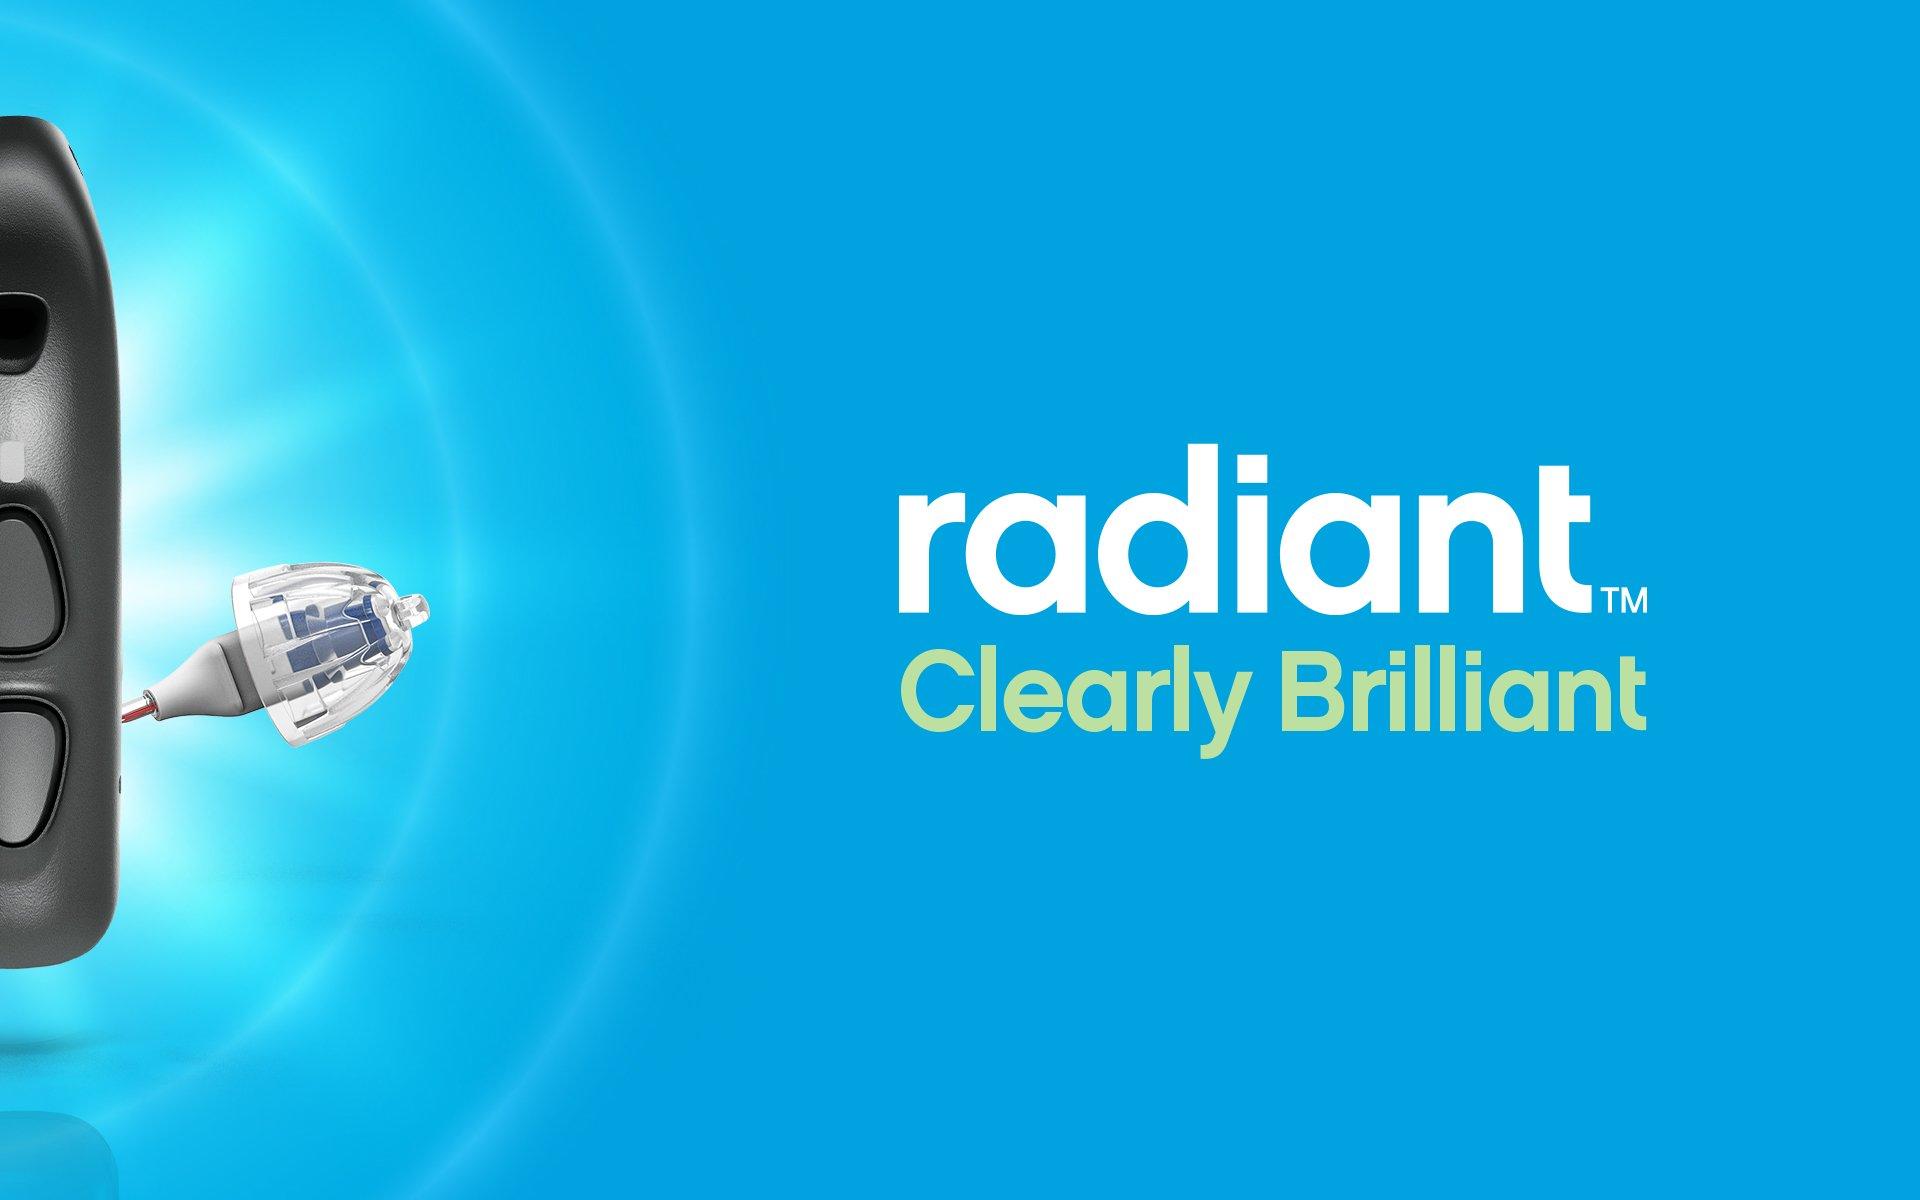 radiant-featured